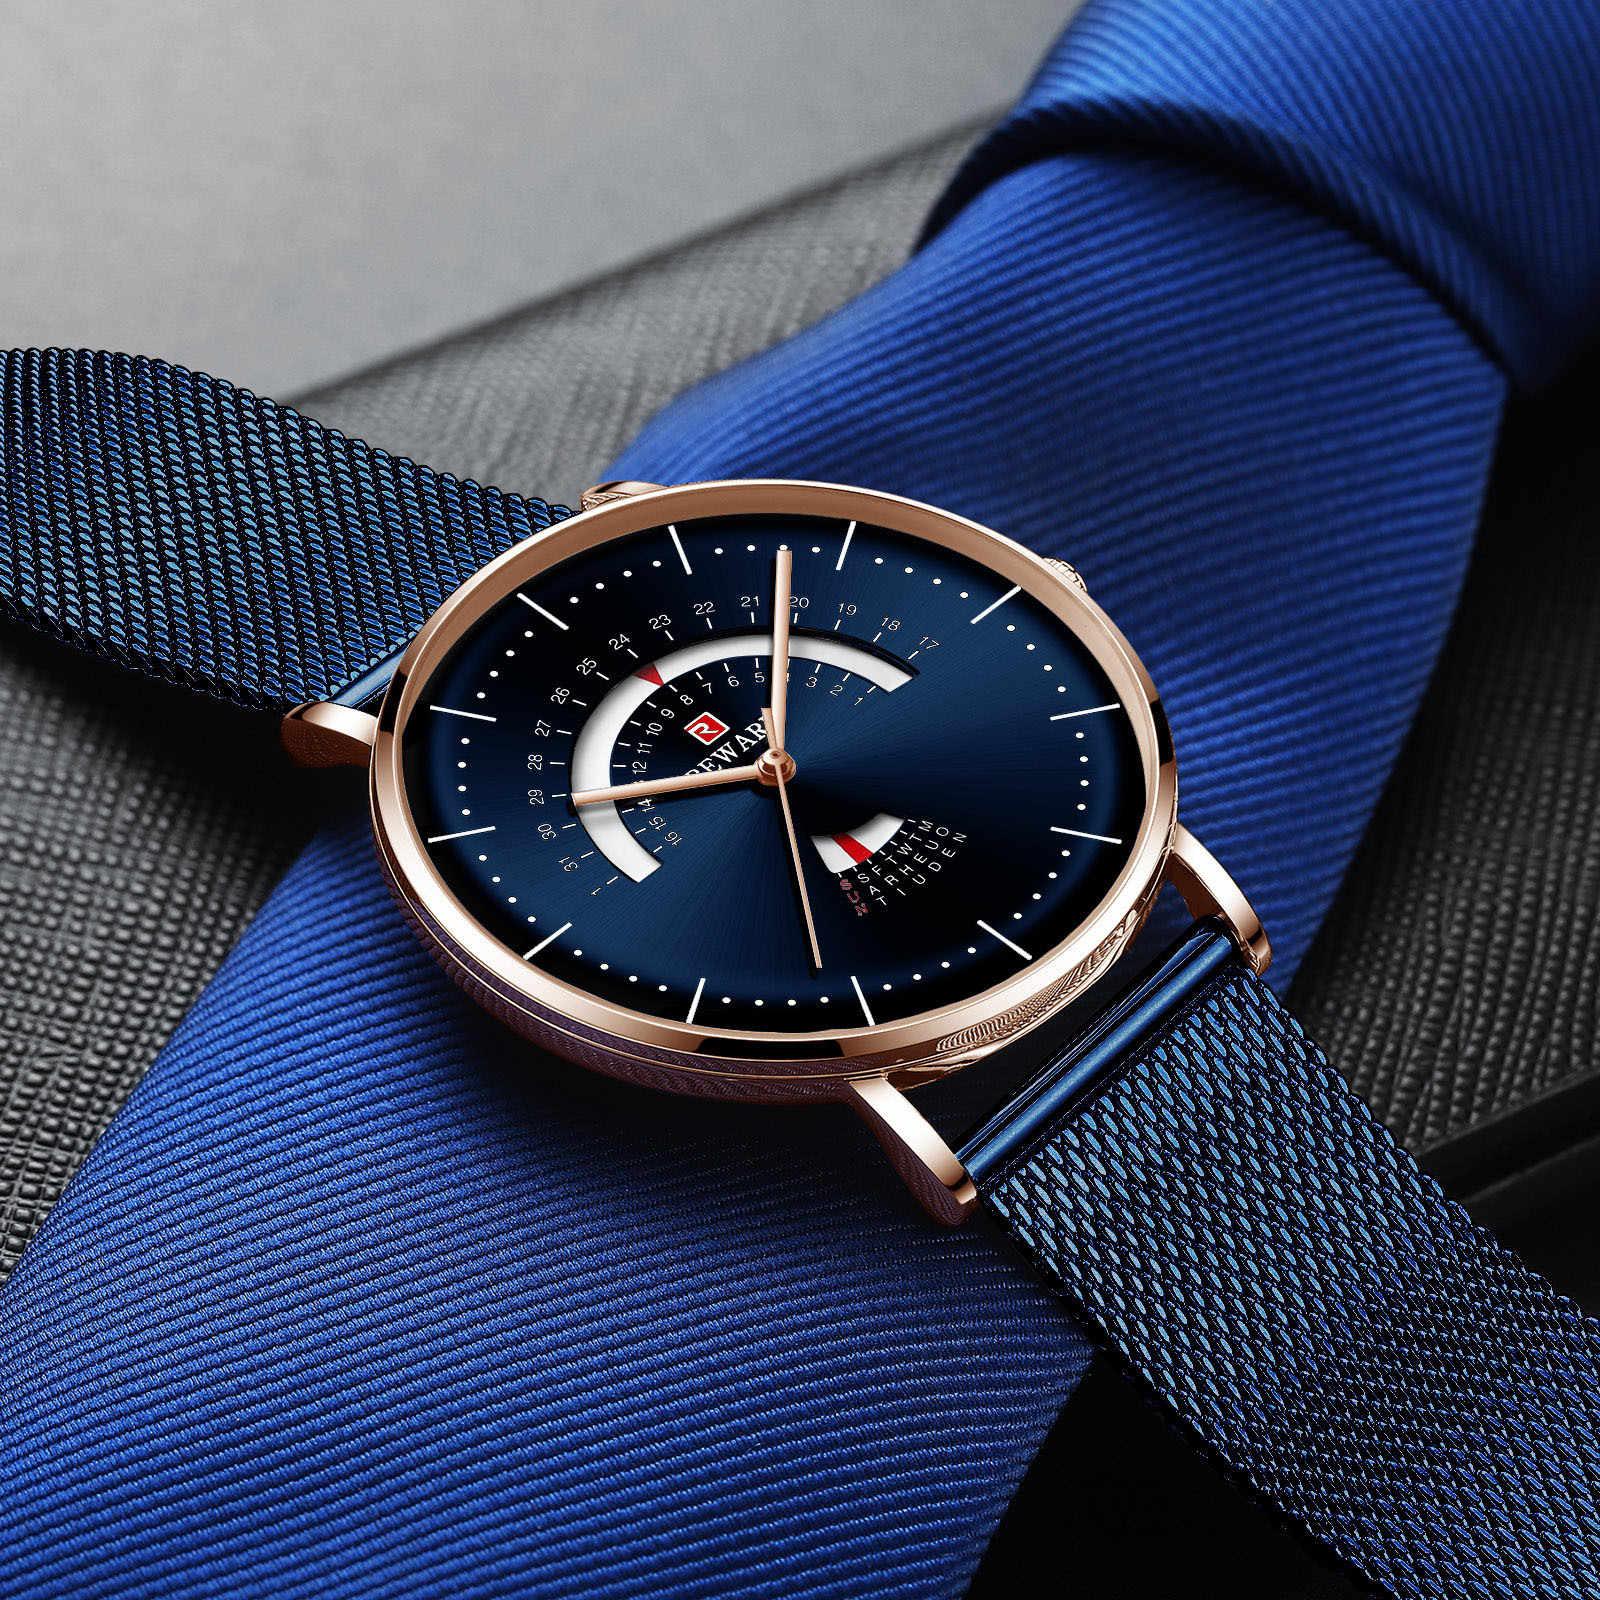 Mens שעוני אופנה אוטומטי תאריך קוורץ שעון גברים זהב פלדת עסקים Mens יצירתי שעונים מותג שעון Relogio Masculino